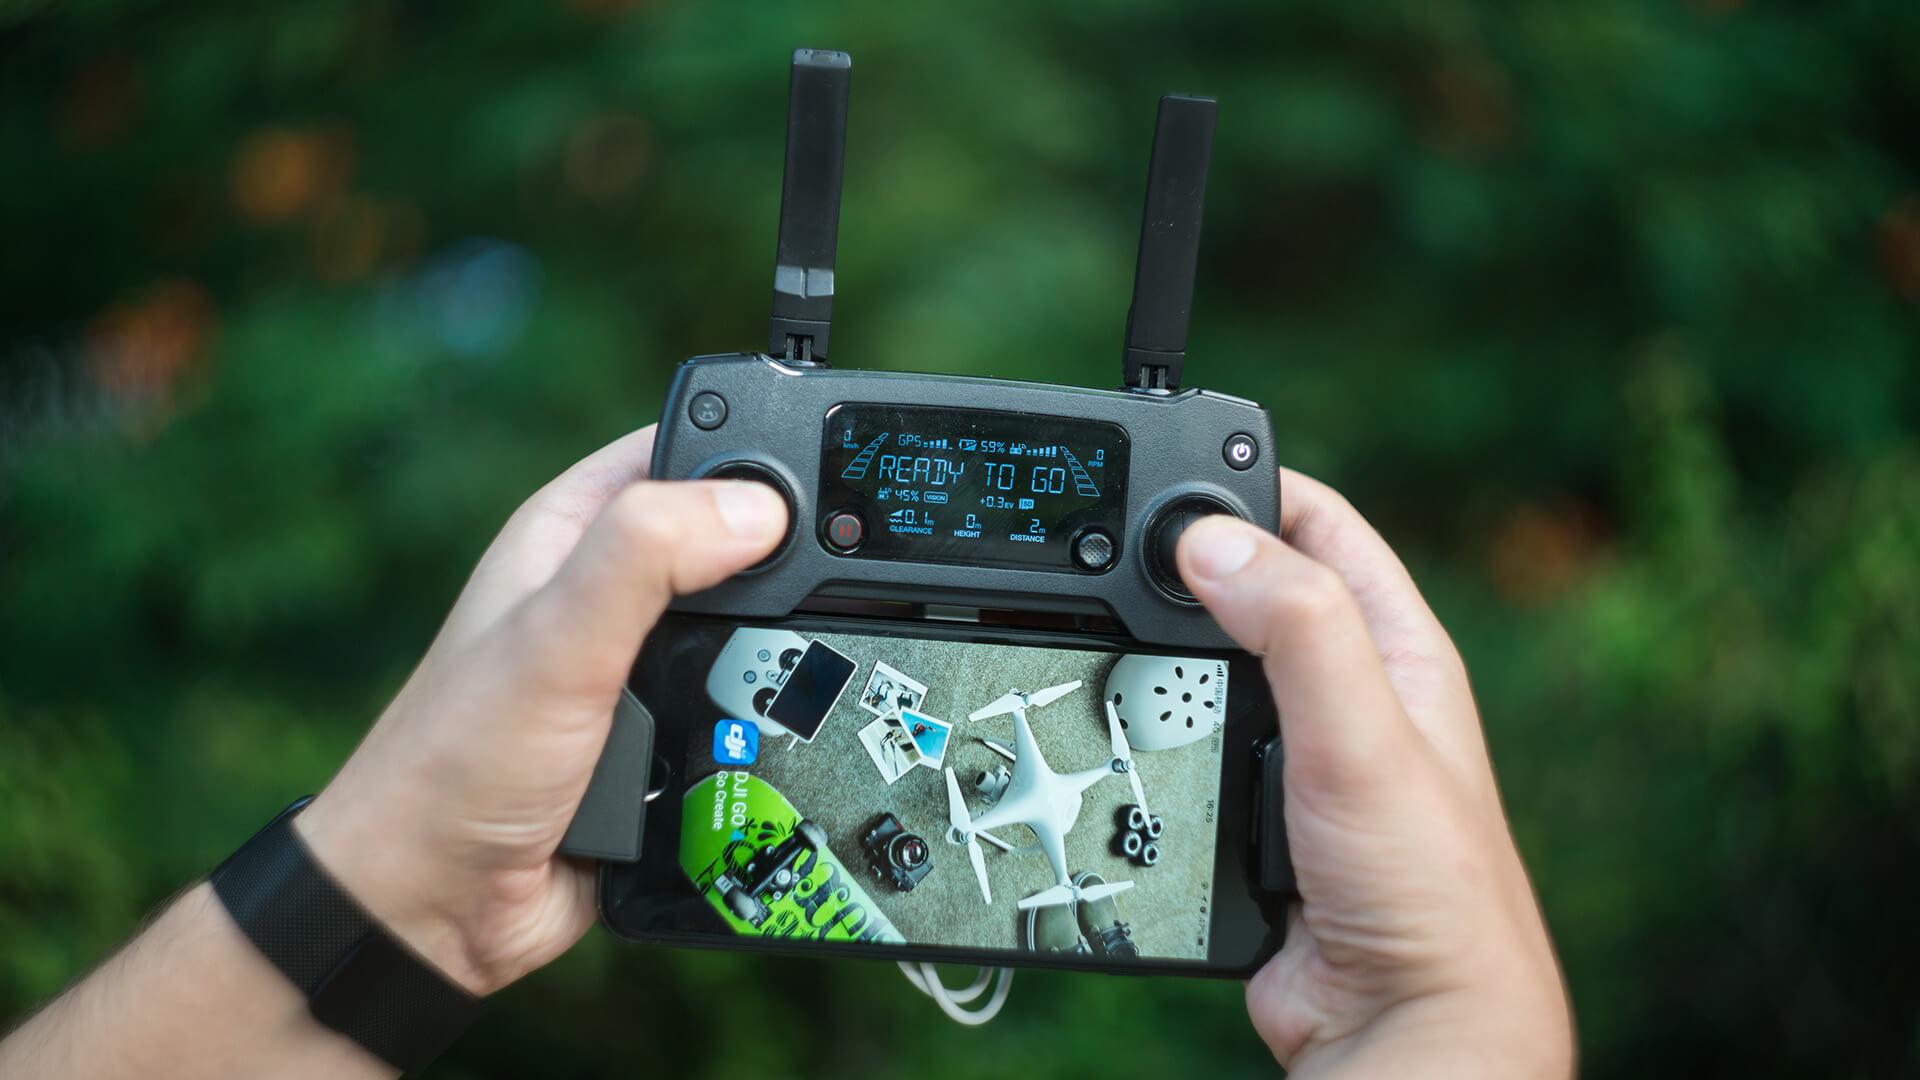 Dji go 4 mavic air combo pro extra battery phantom собственными силами